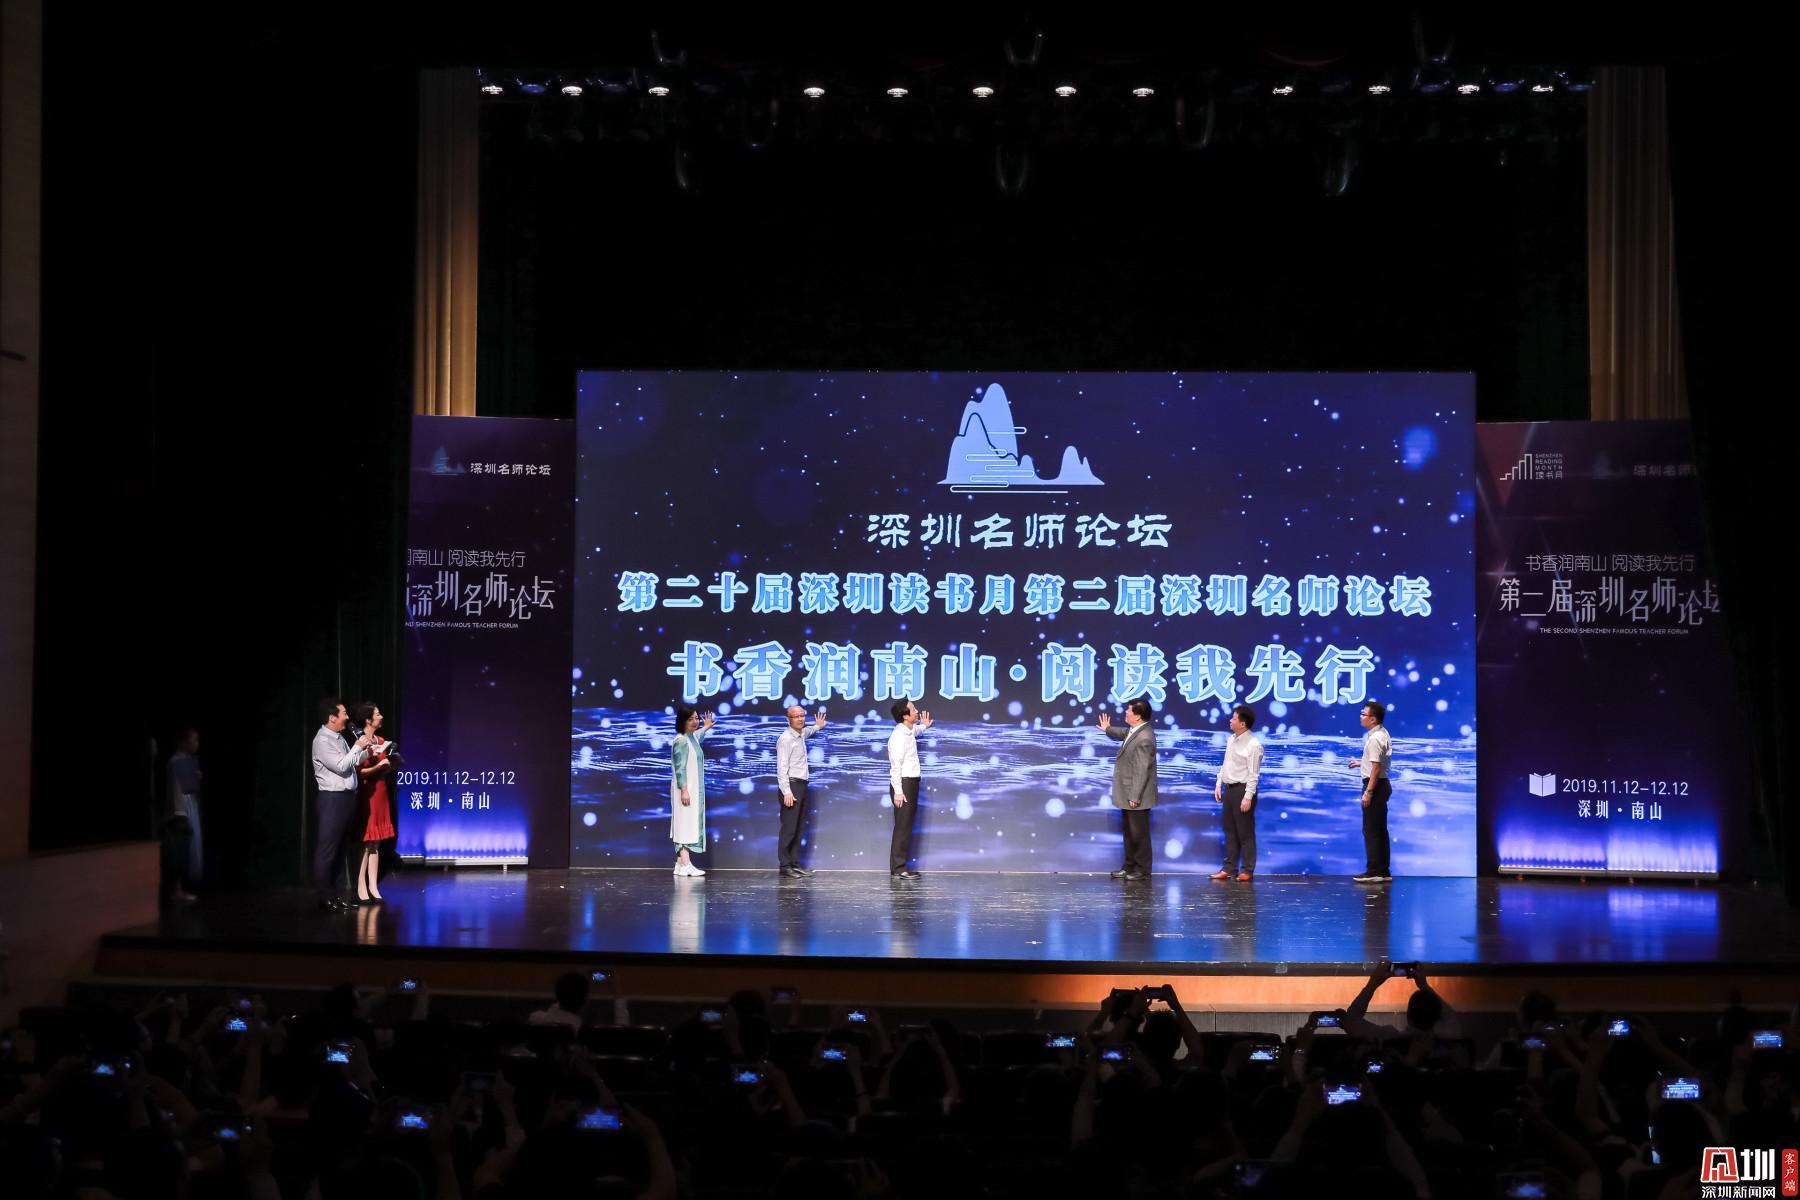 http://www.szminfu.com/shenzhenjingji/28951.html